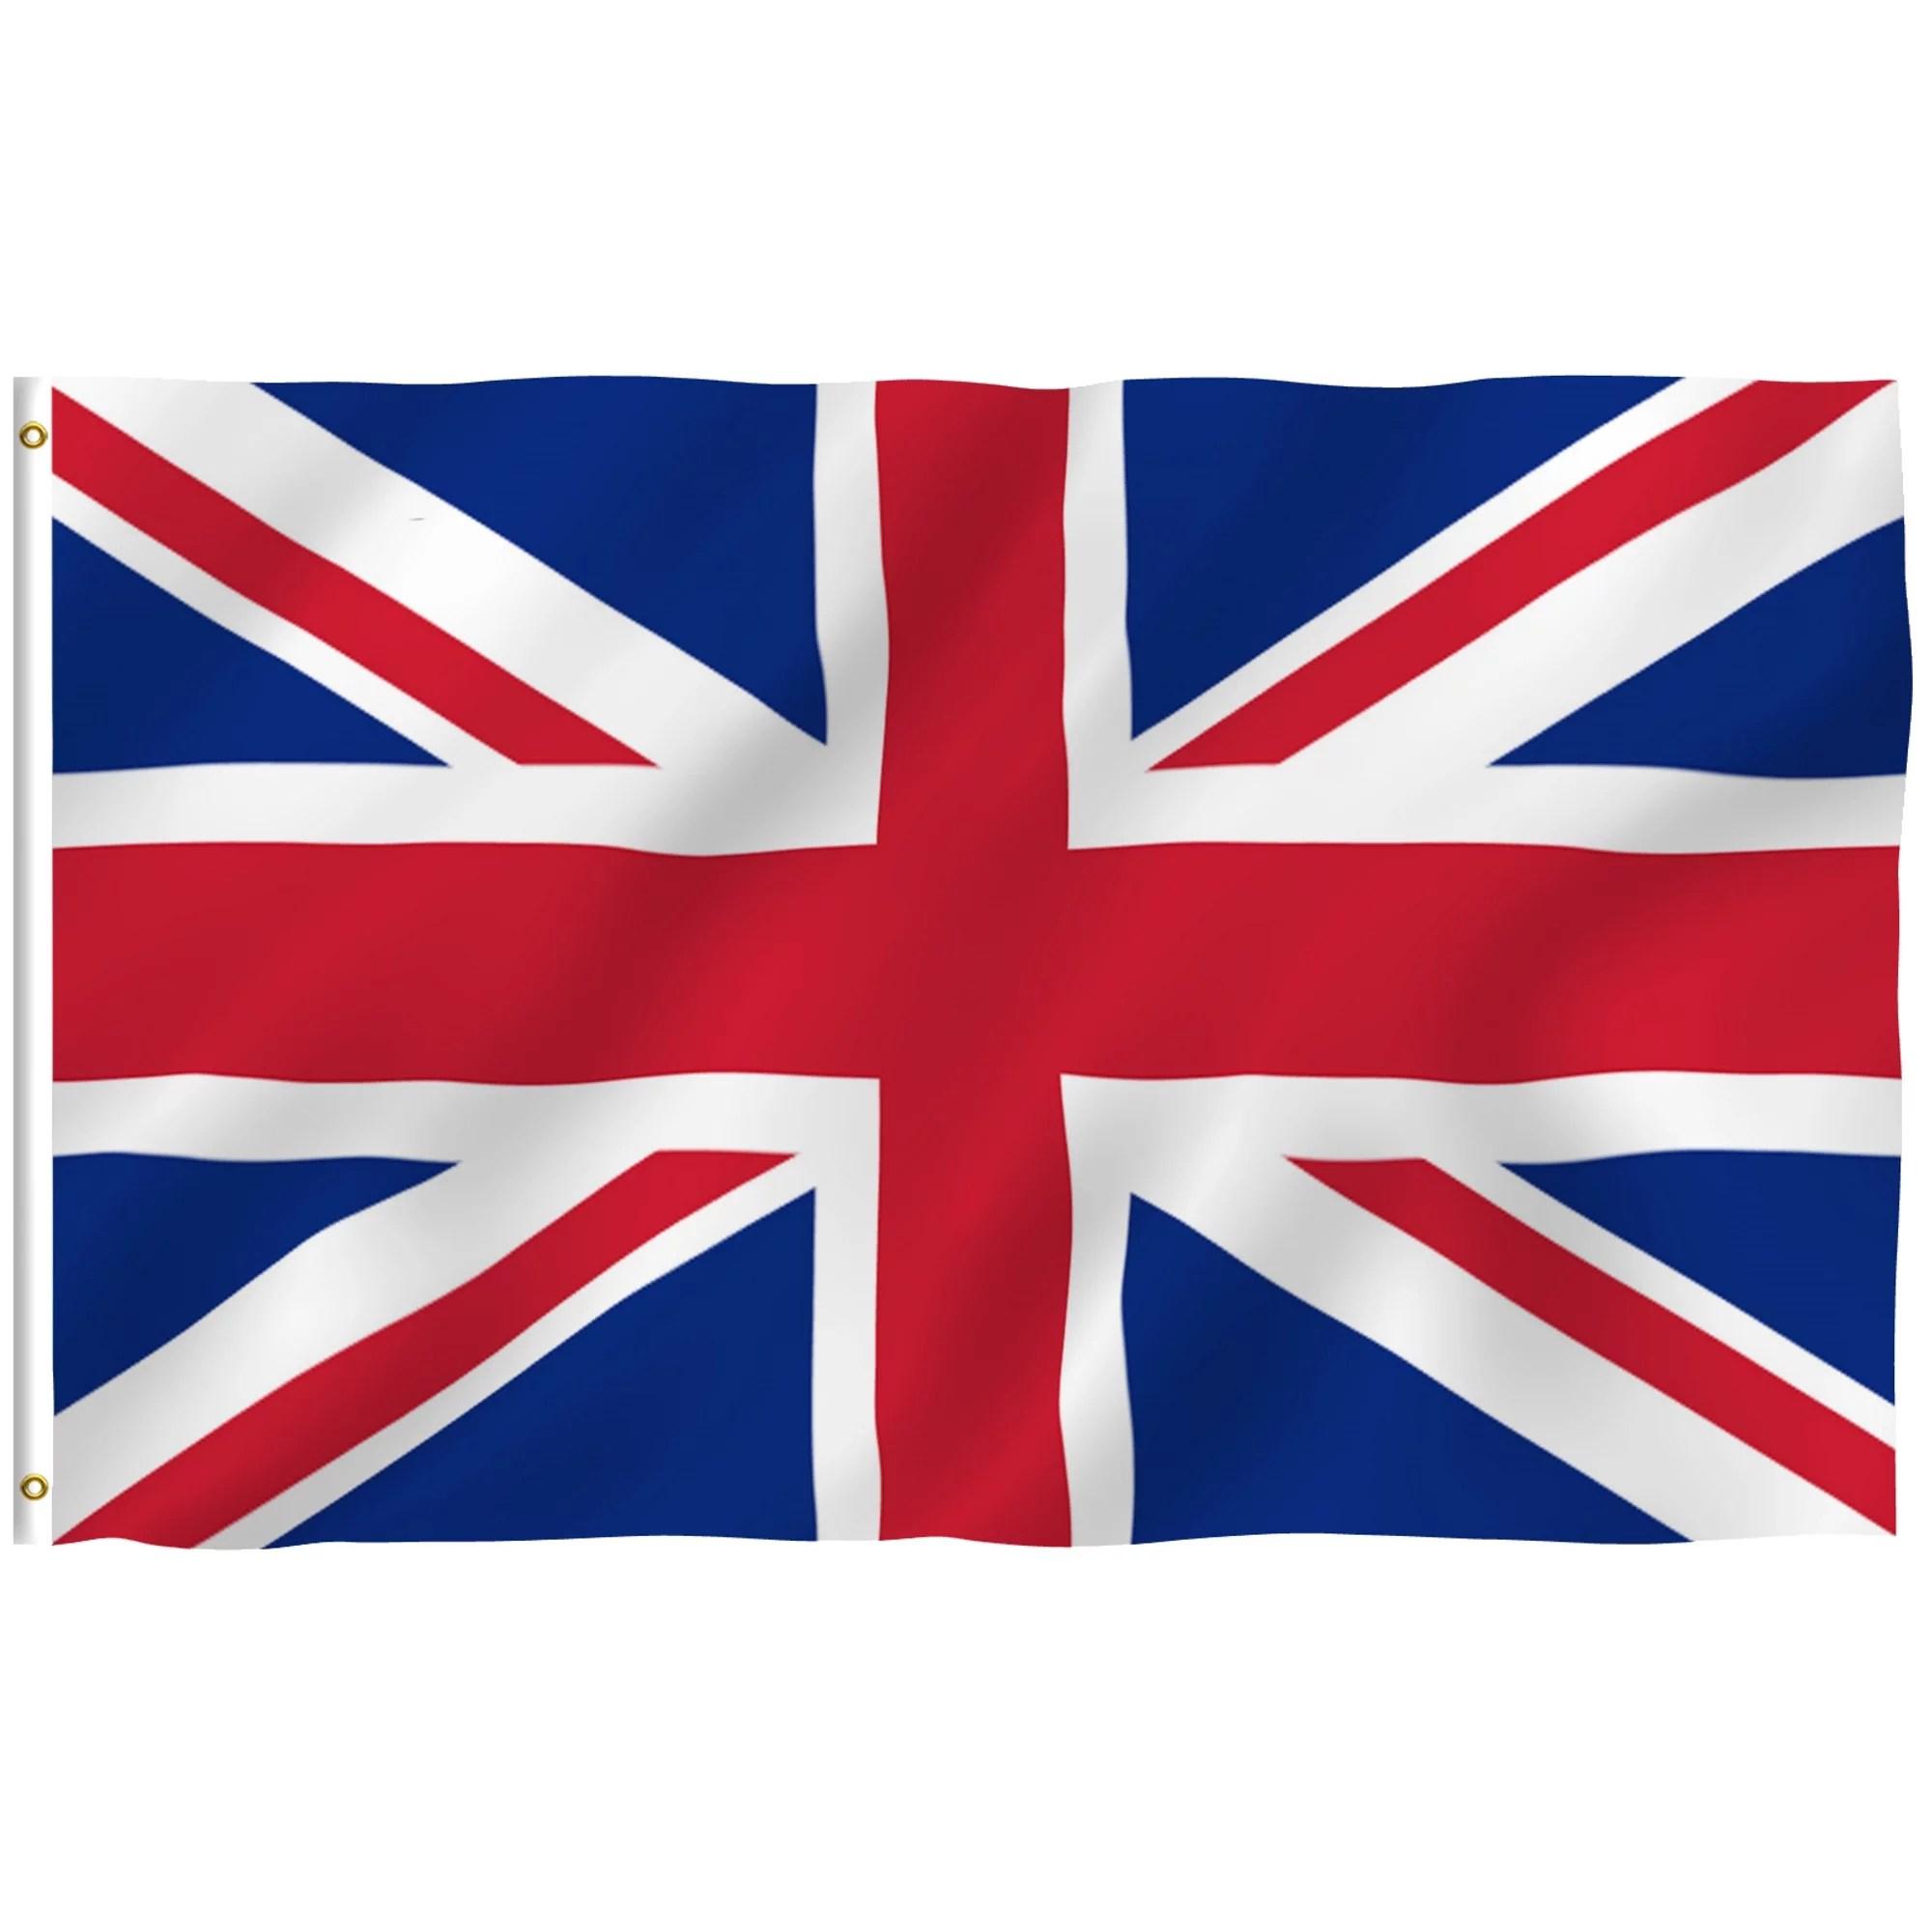 Anley Fly Breeze 3x5 Feet British Flag